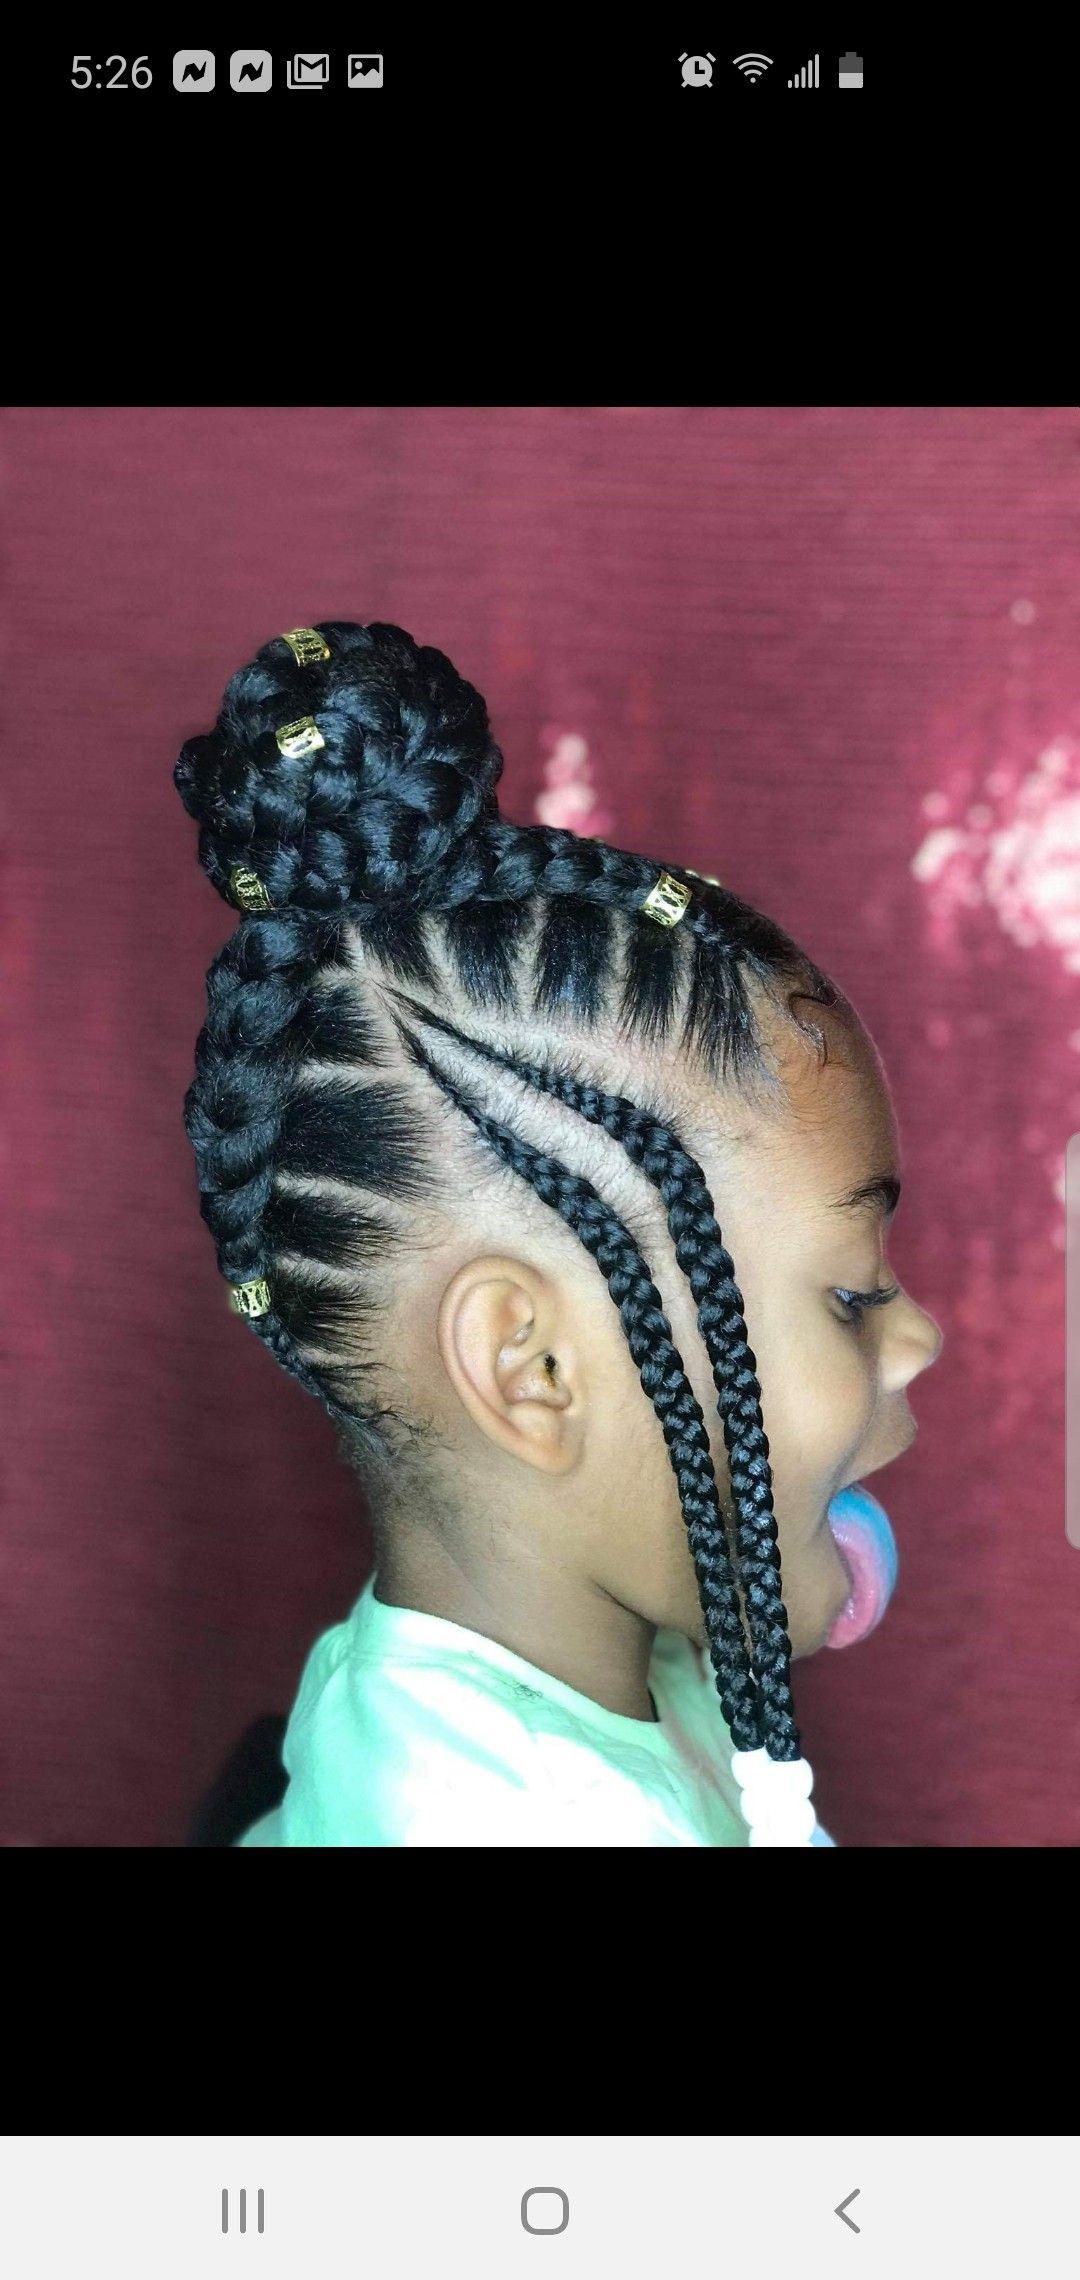 Pin By Tiffany Sudbury On Hair Ideas Box Braids Hairstyles For Black Women Braided Hairstyles For Black Women Hair Styles